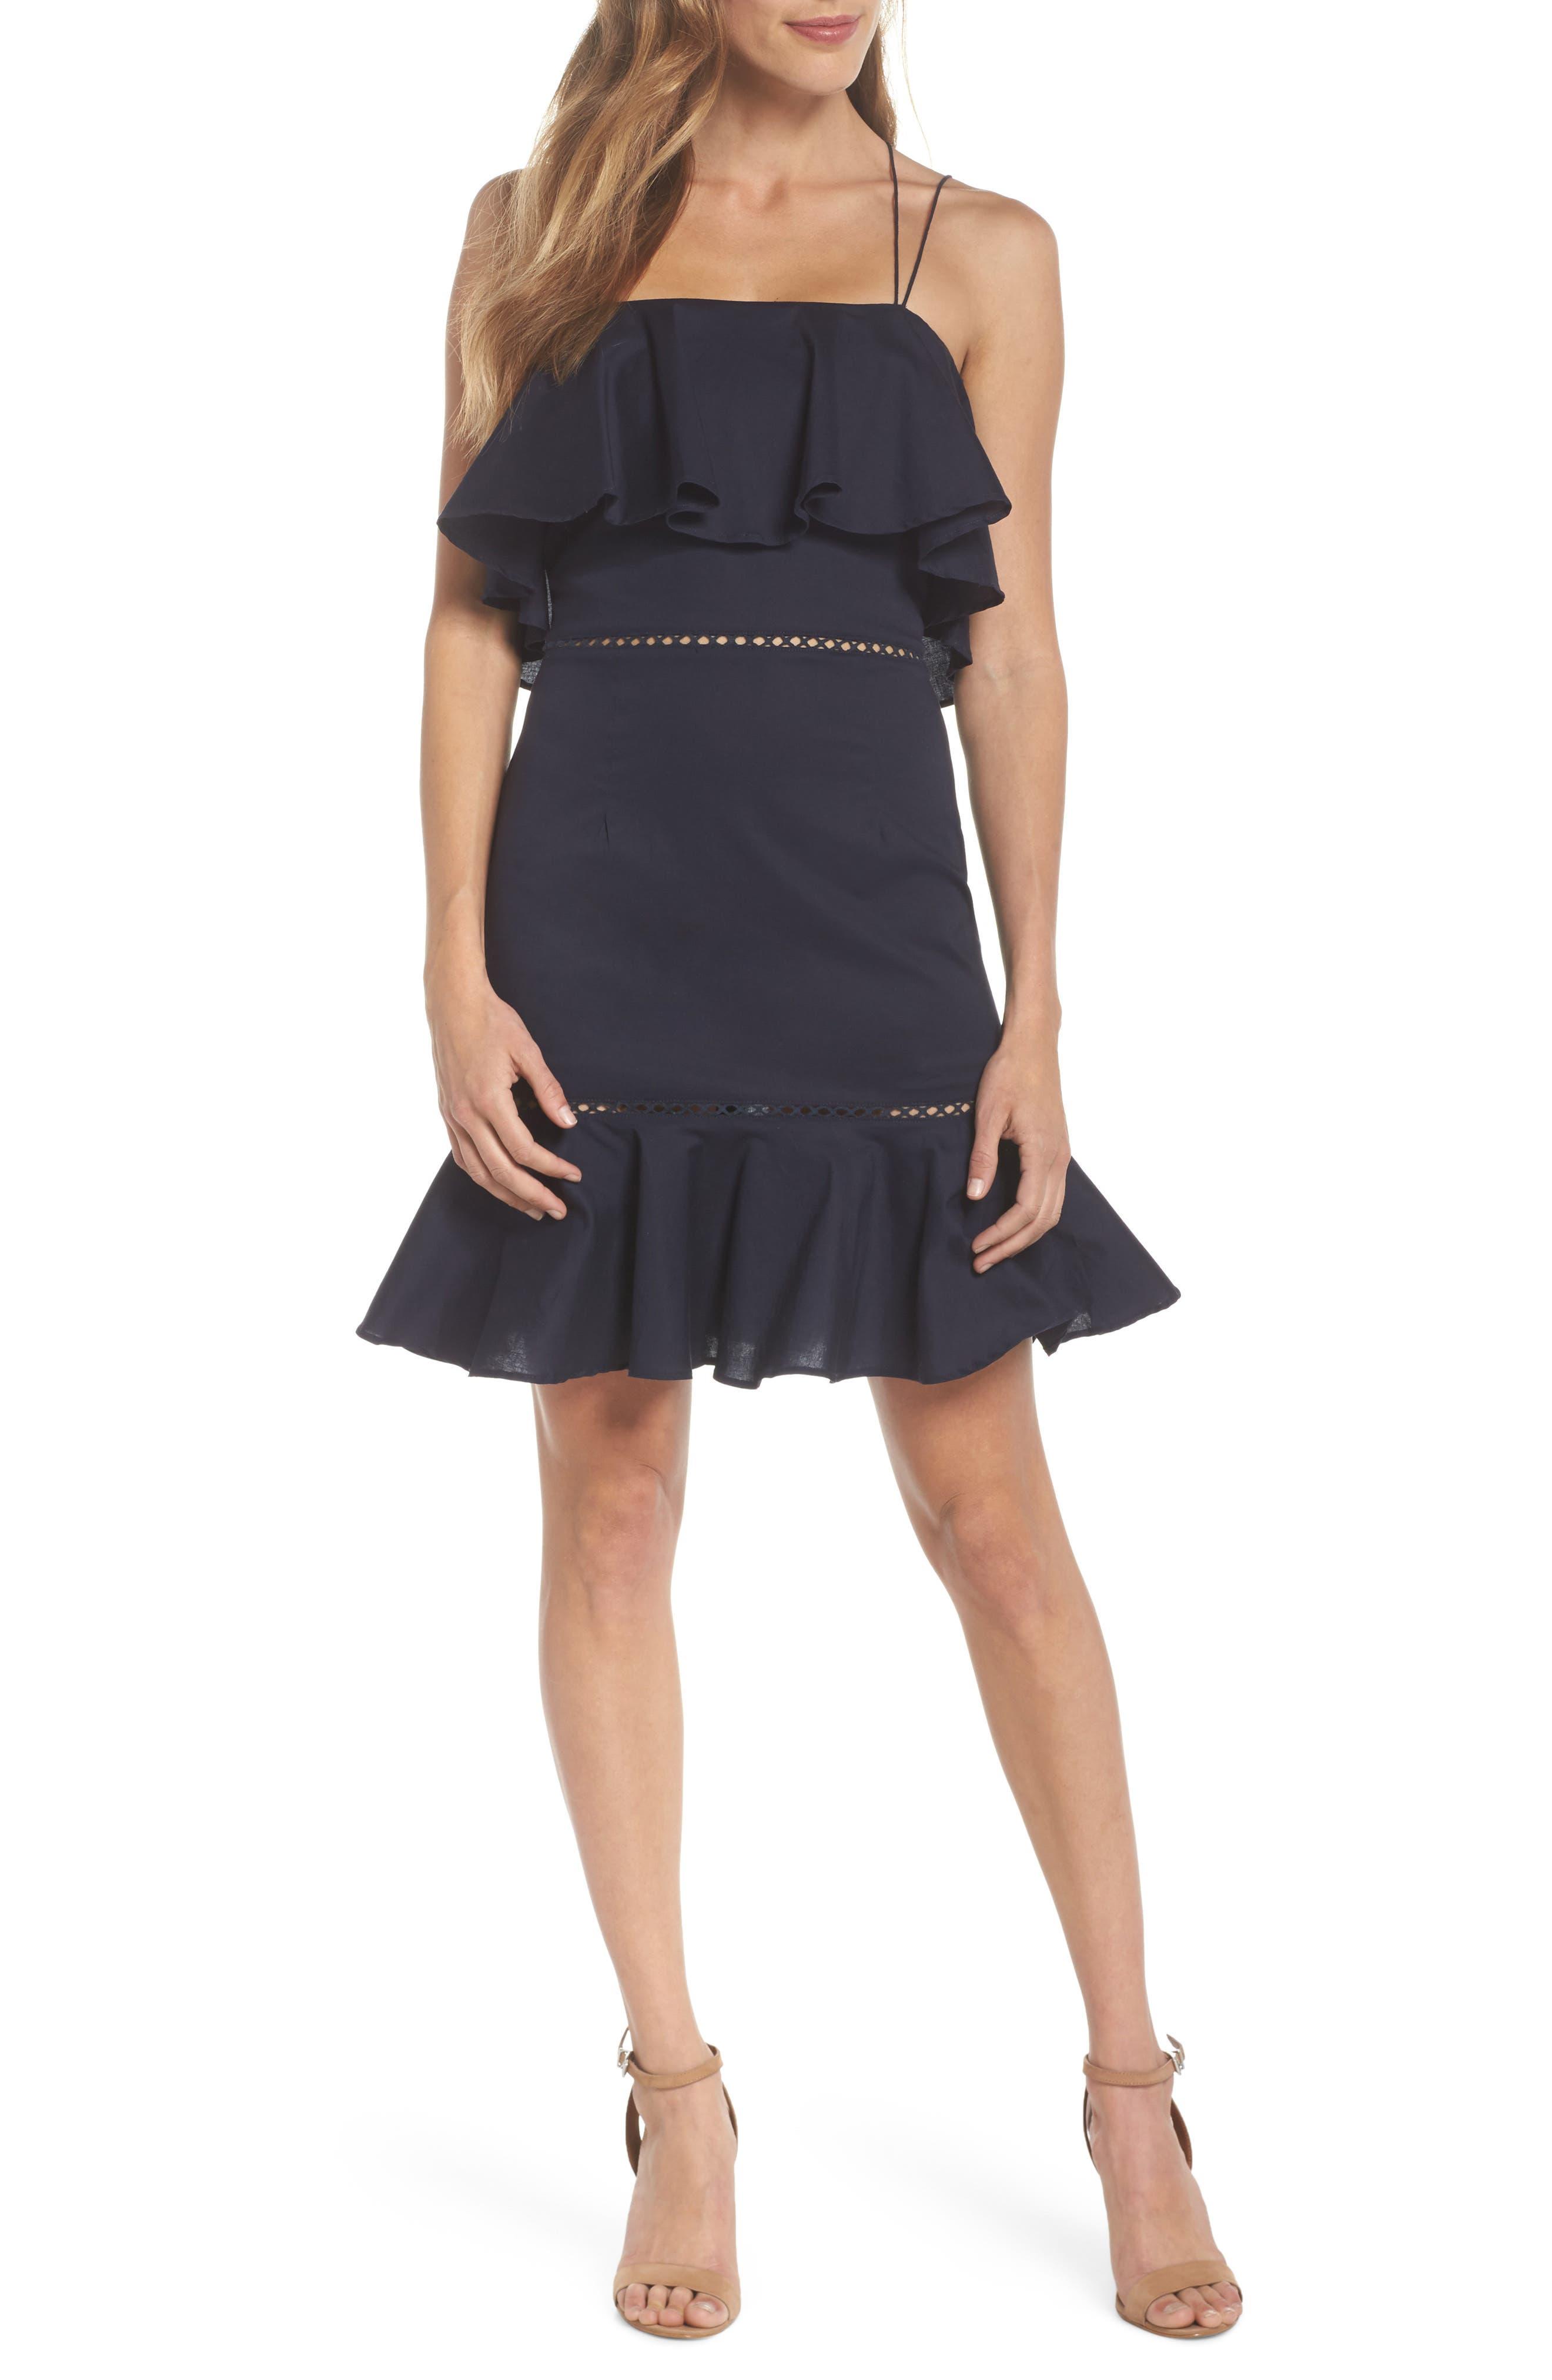 NSR Lola Poplin Ruffle Dress